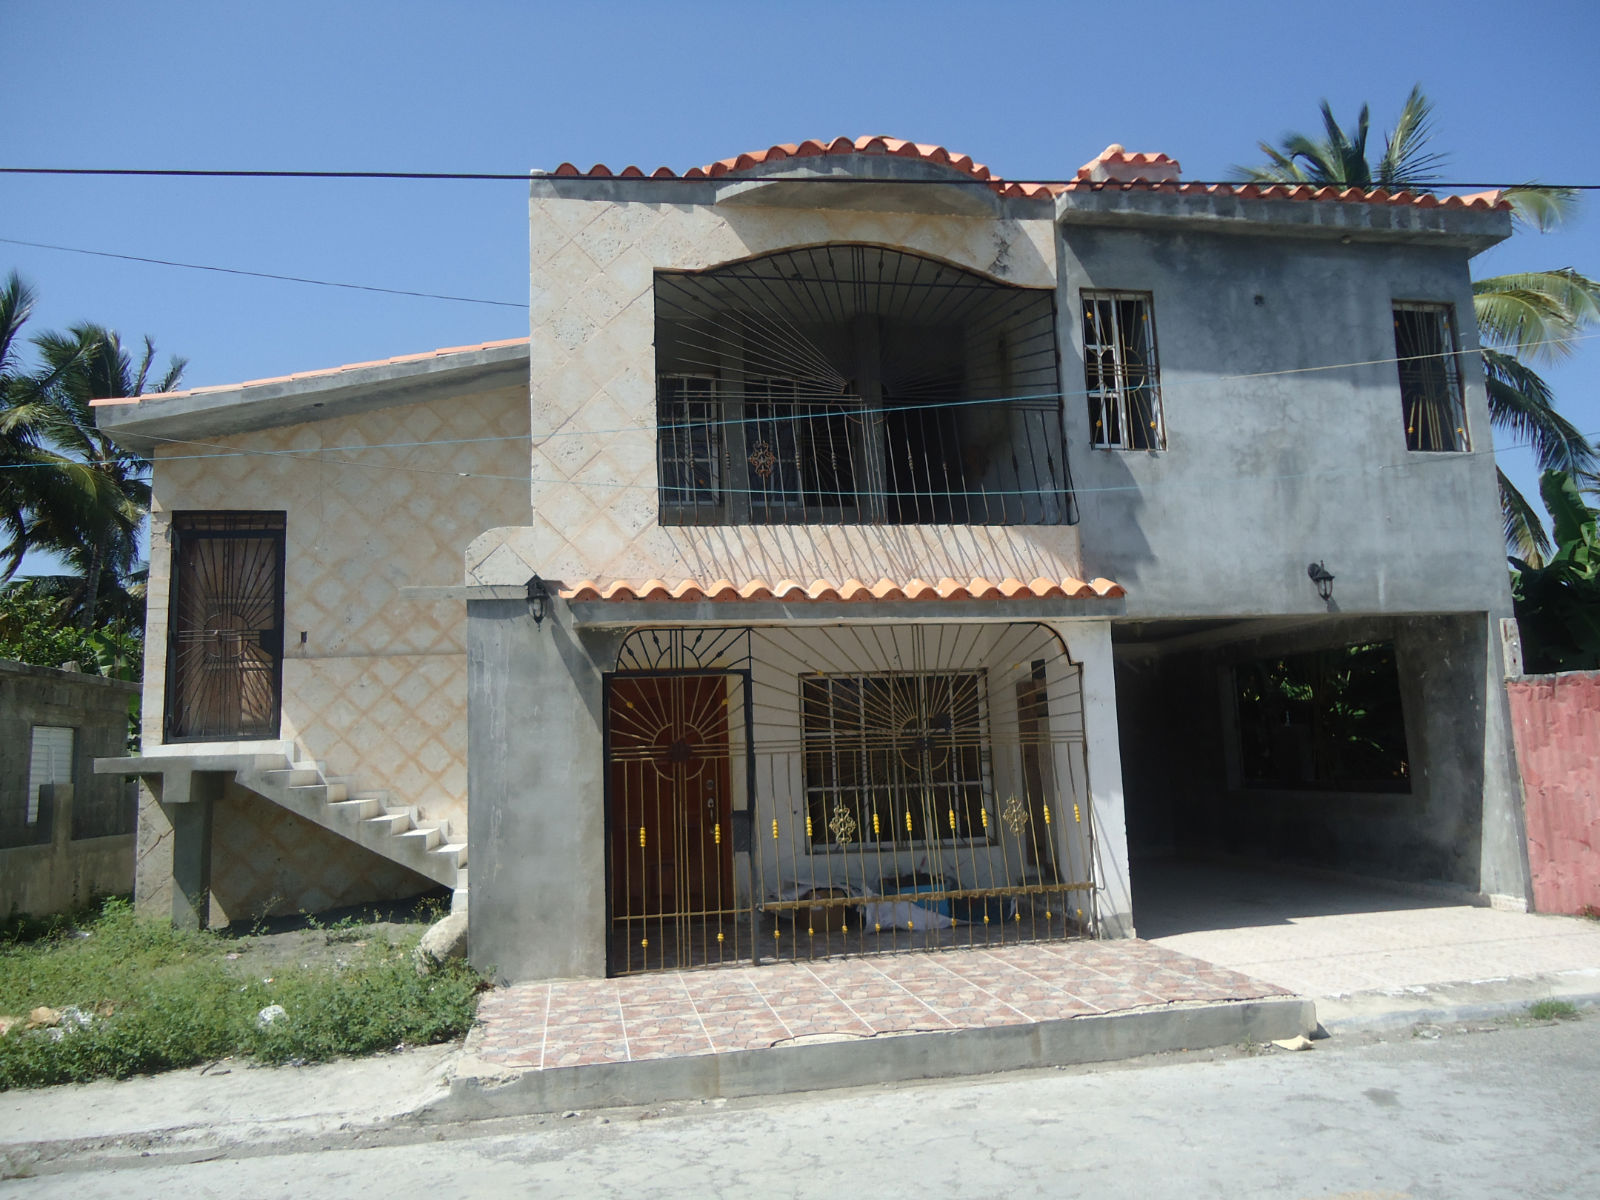 Unfinished Dominican Home in the village of Palmar De Ocoa, Bani